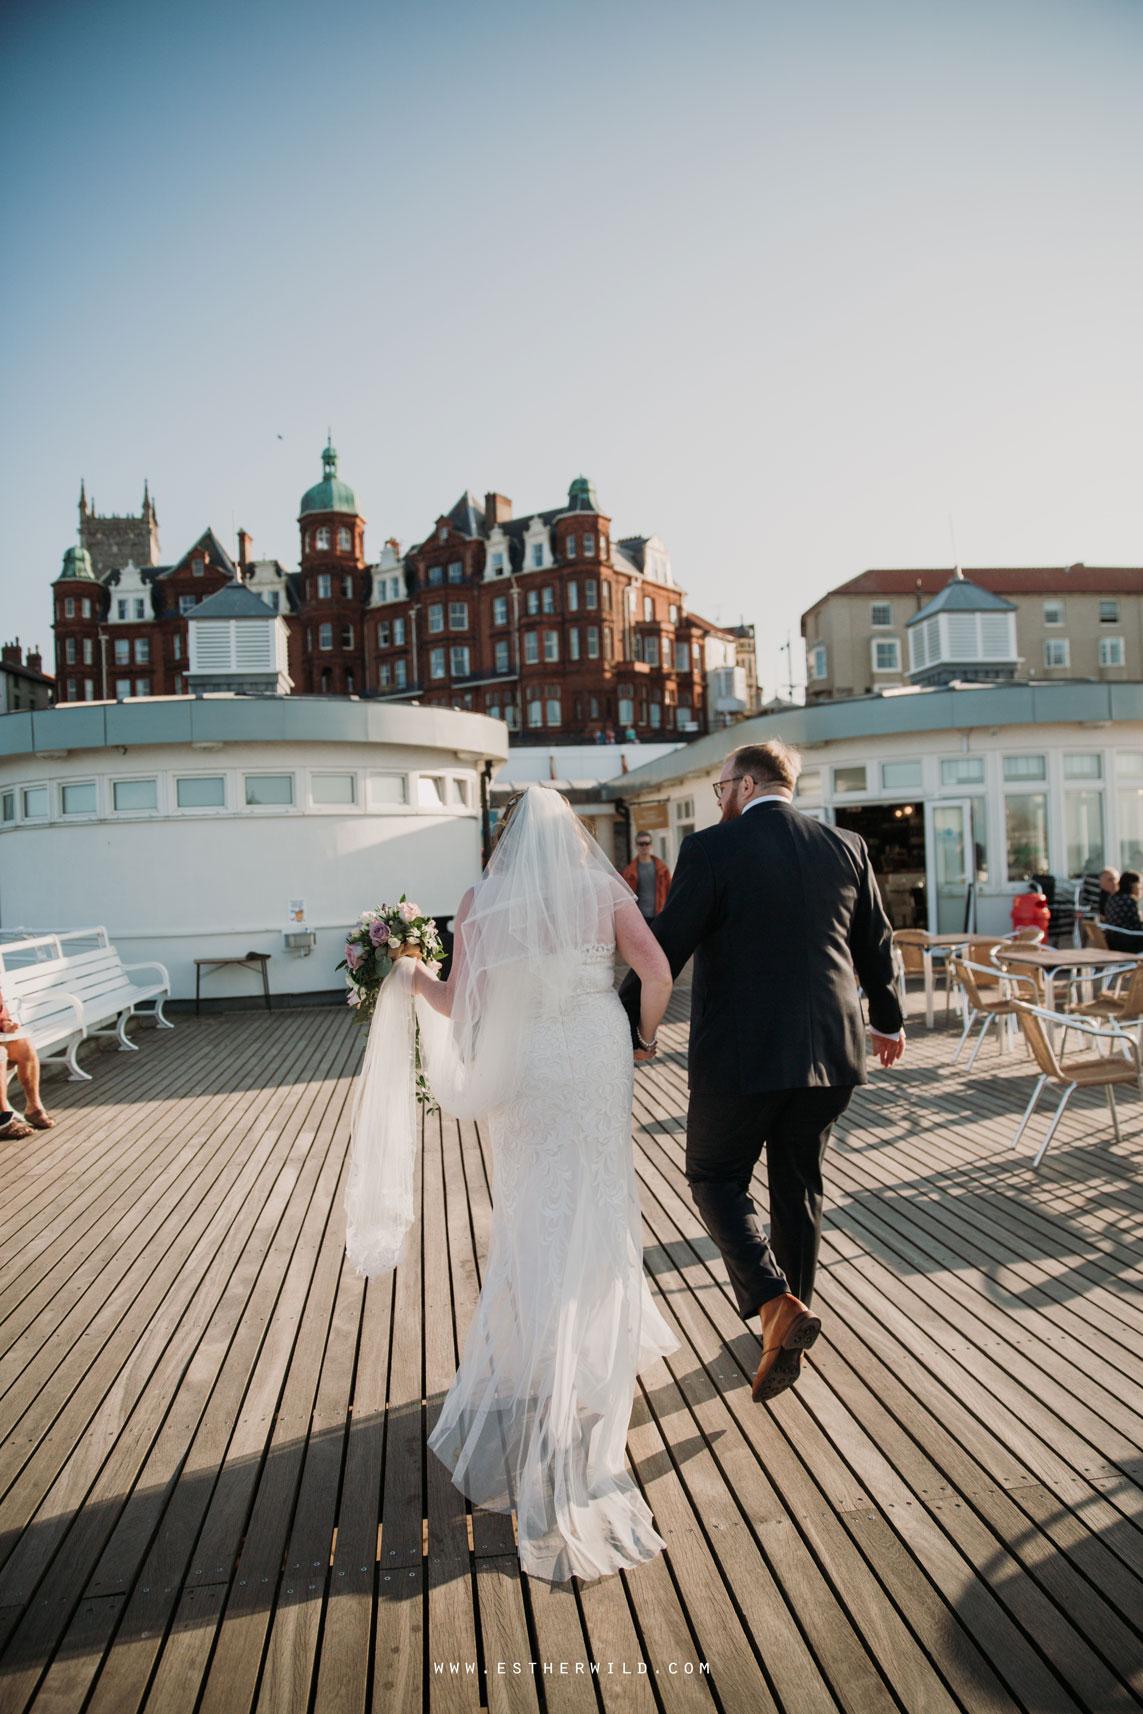 Cromer_Wedding_Beach_Outdoor_Ceremony_Norfolk_North_Lodge_Registry_Office_Rocket_House_Cafe_Cromer_Pier_IMG_4688_IMGL8410.jpg